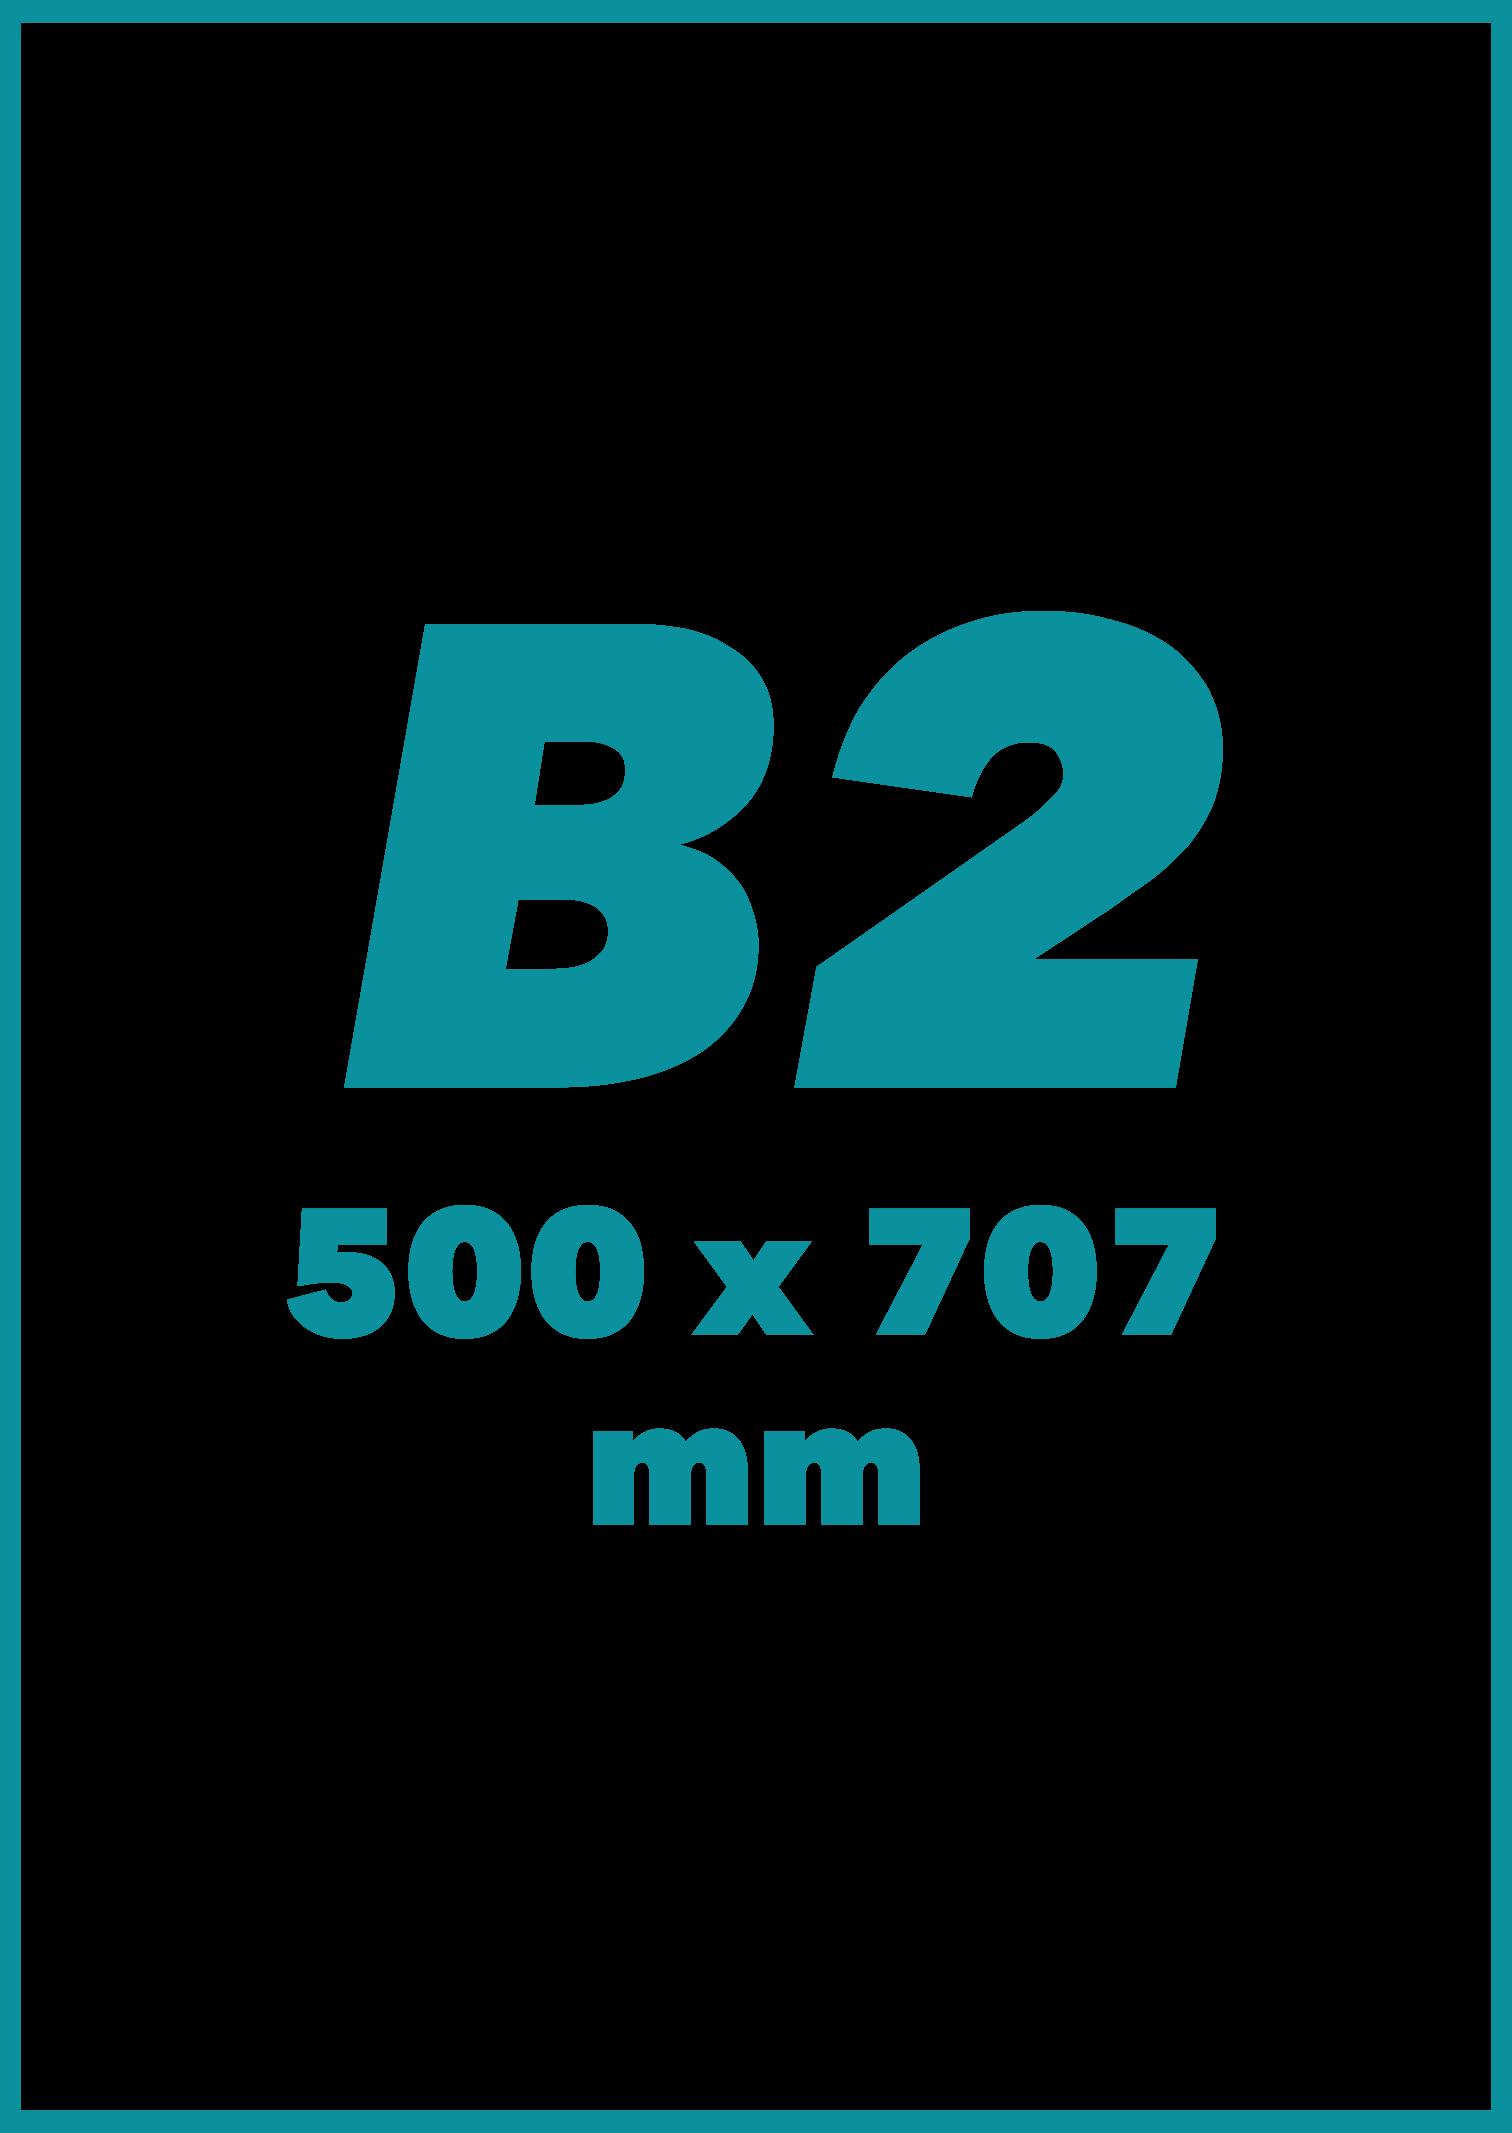 B2 Formatas